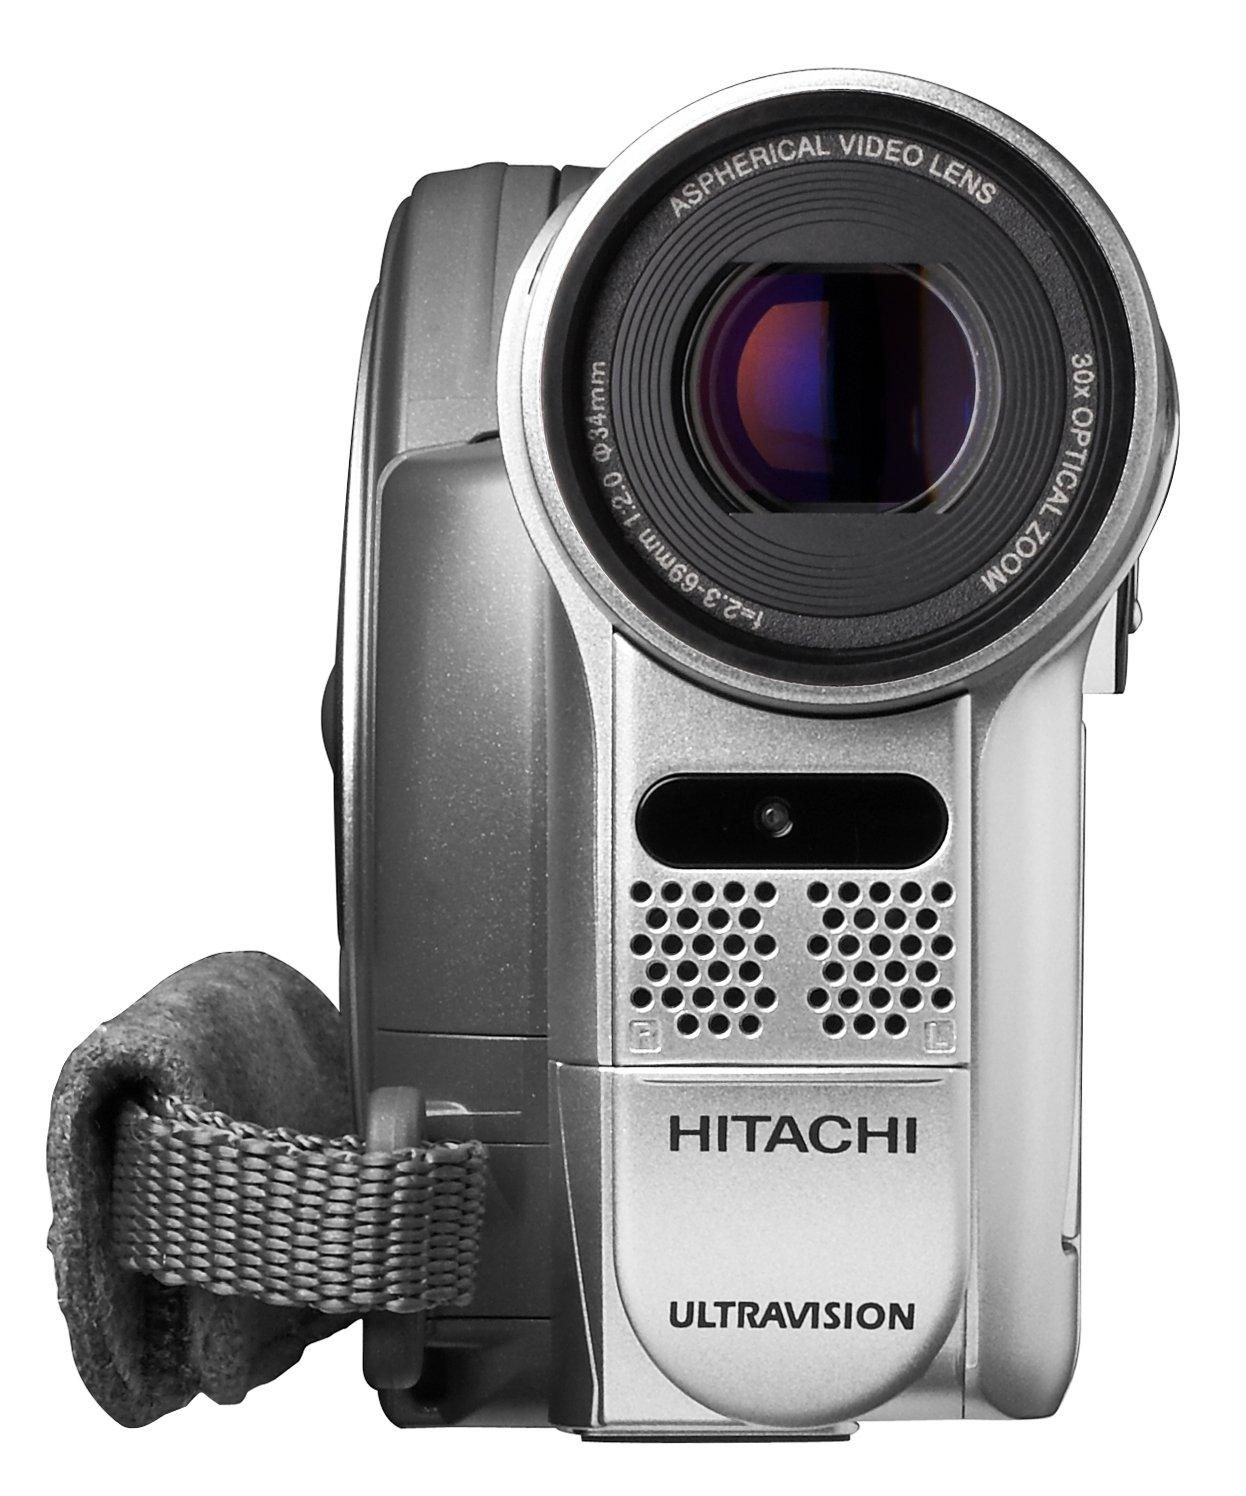 amazon com hitachi dzgx5020a dvd camcorder with 30x optical zoom rh amazon com Hitachi StarBoard Manual hitachi dvd cam dz-gx5020a manual